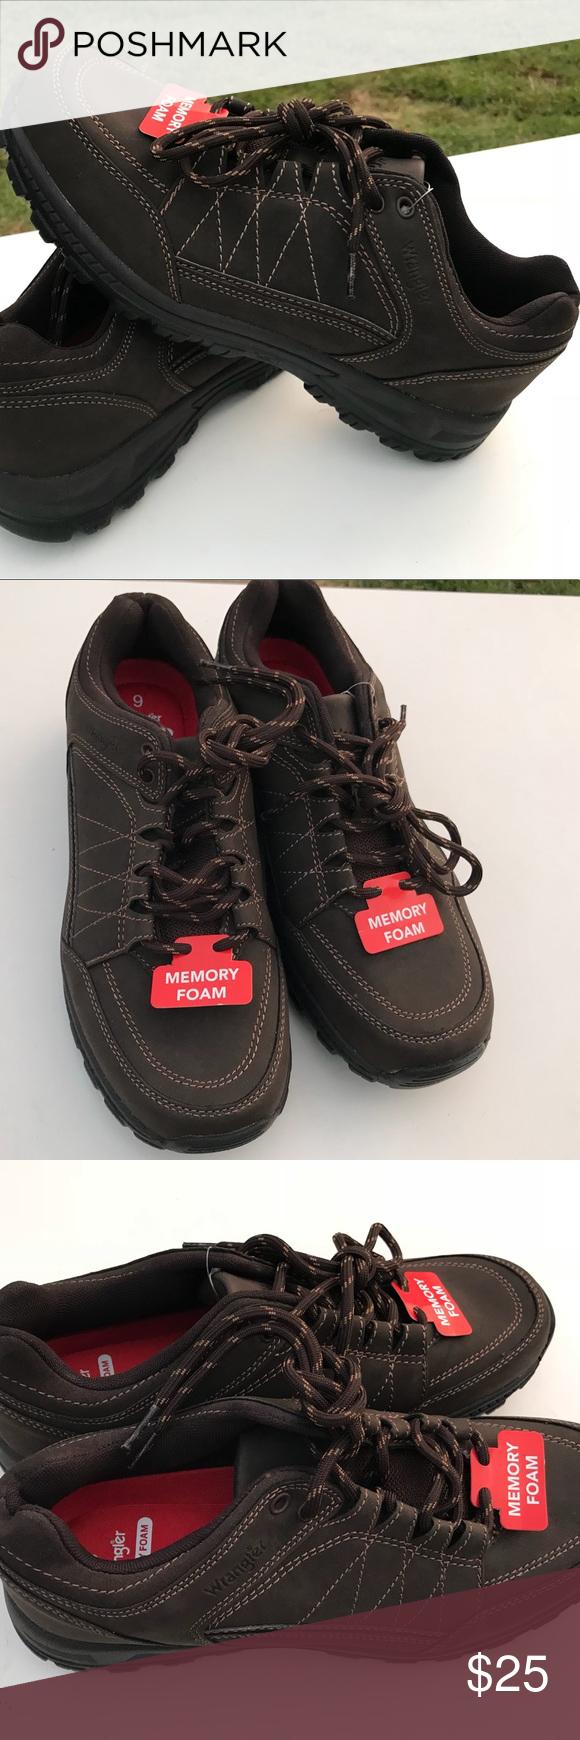 106ffd92 Wrangler Men Casual Oxford Brown Memory Foam Shoe Wrangler Men's Ruggen  Oxford Brown Memory Foam Shoe Size 9 Nw! -Memory Foam -Dual Density Sole ...